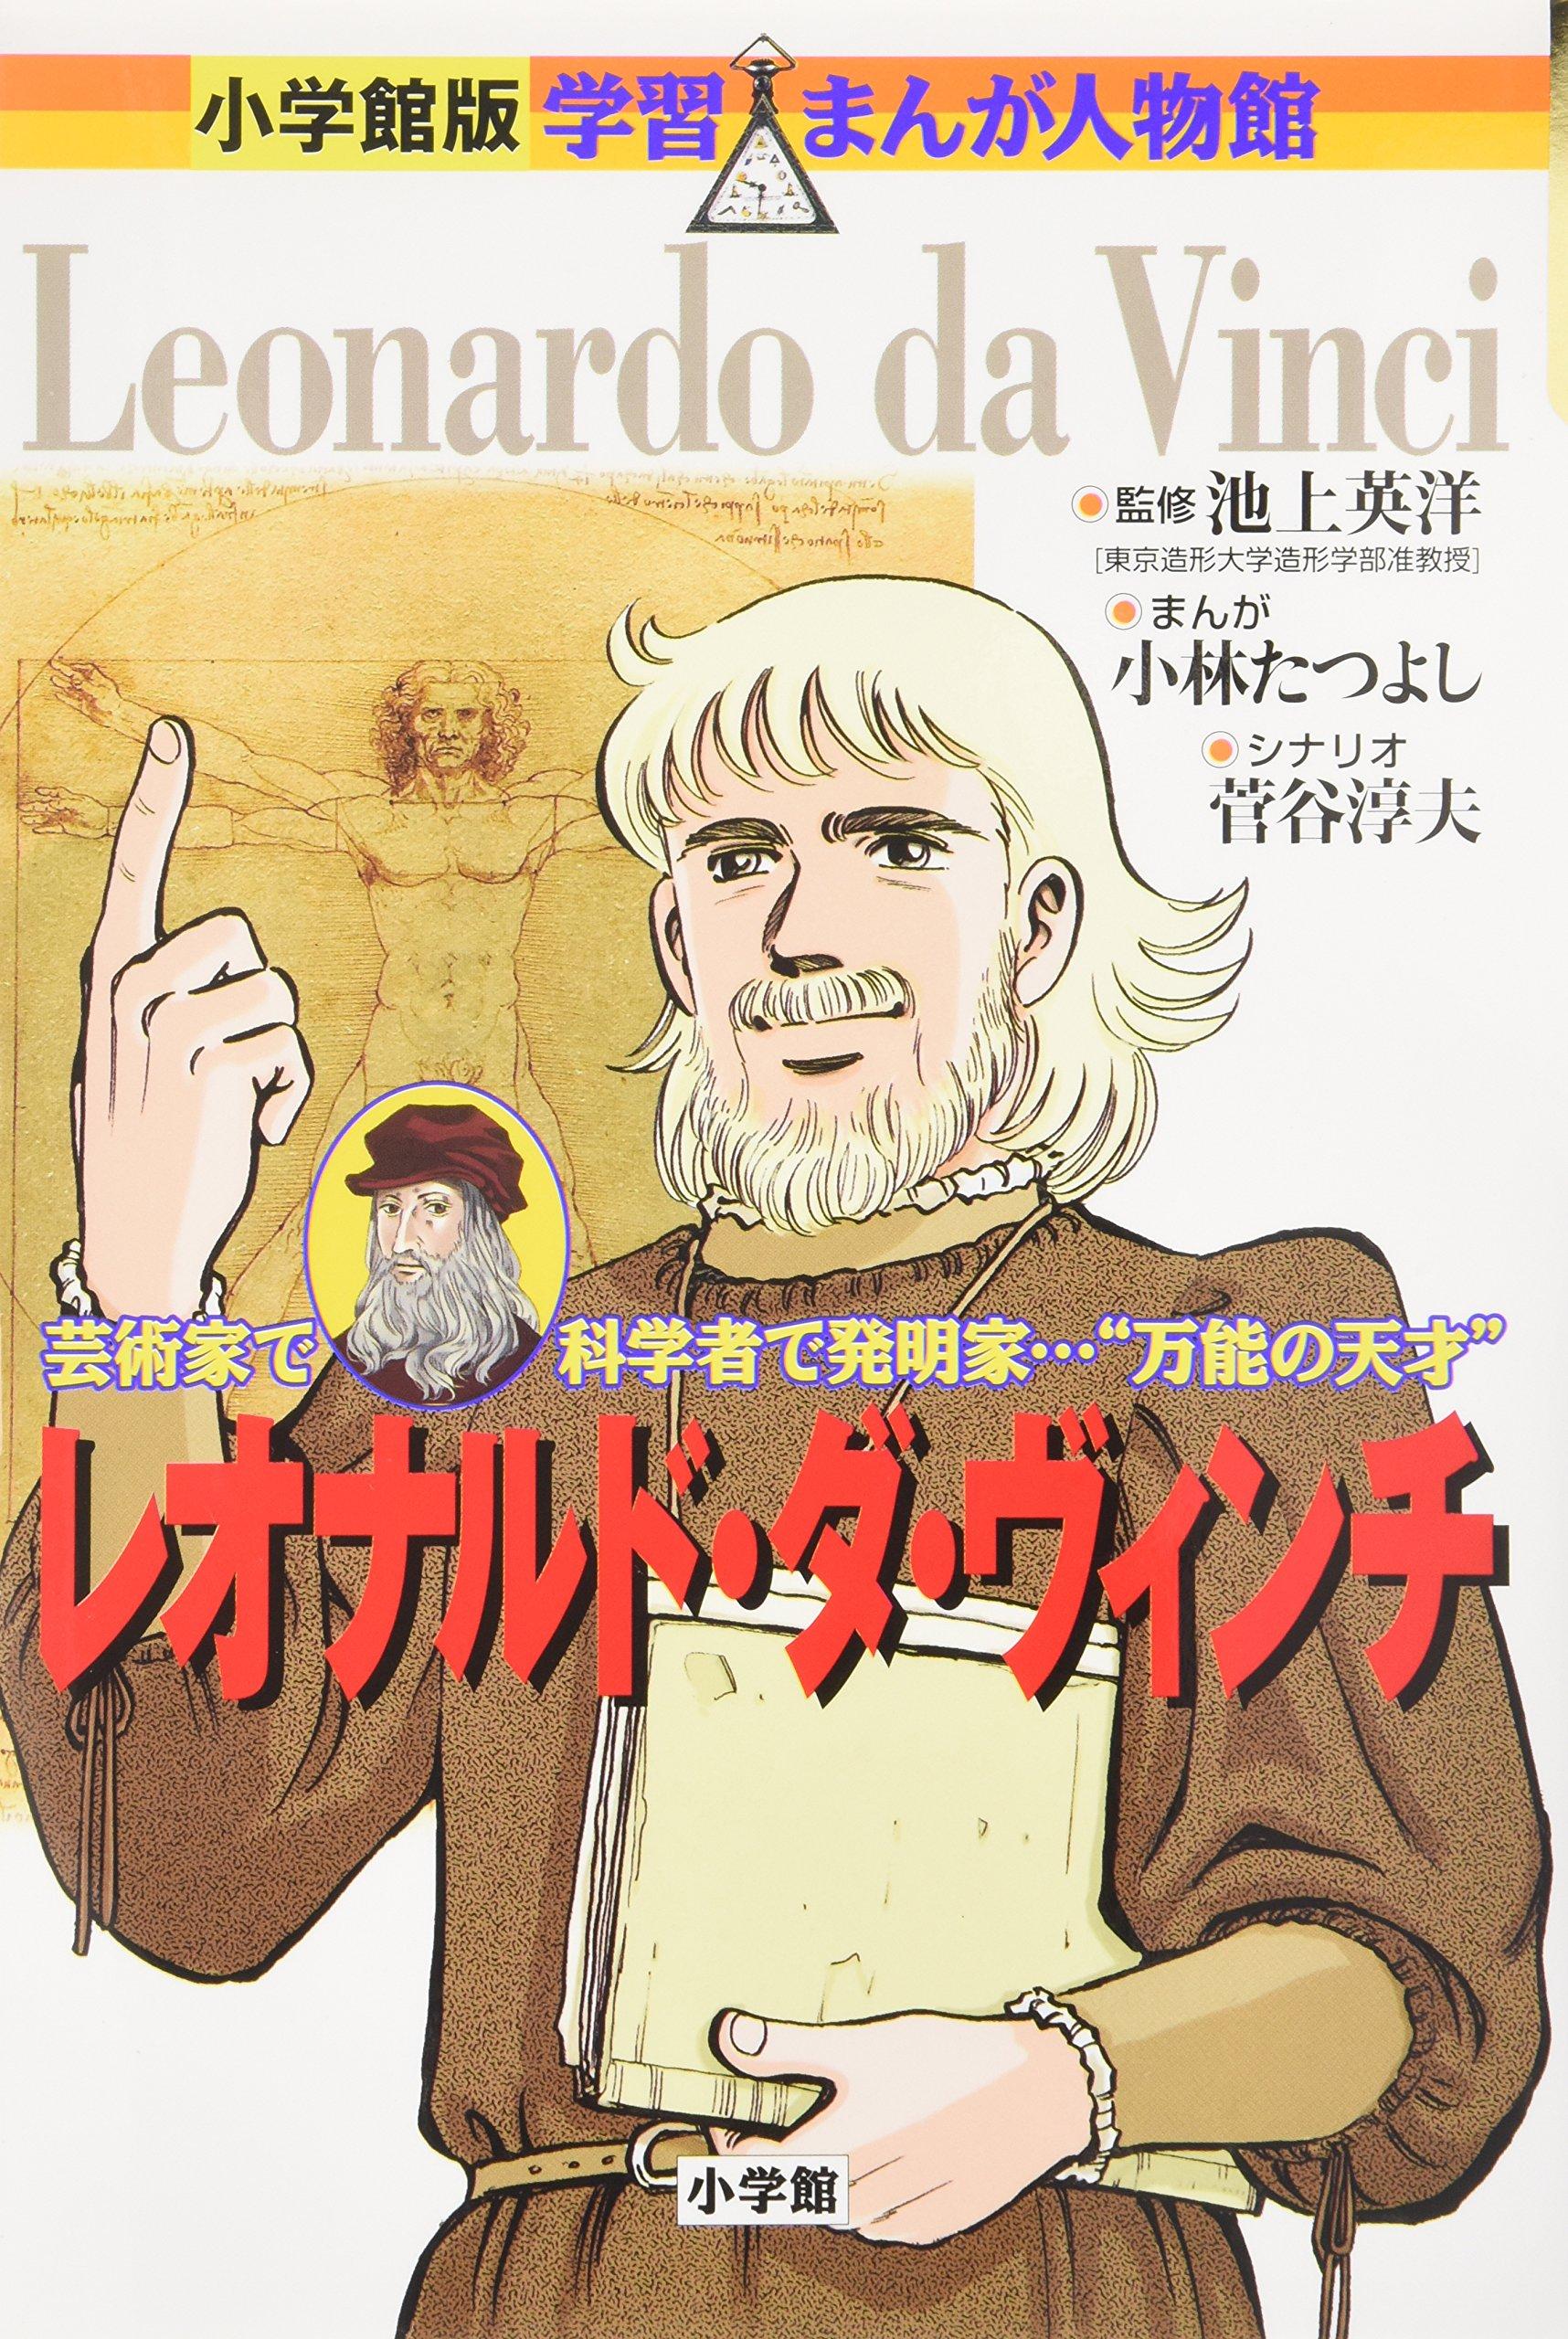 leonardo da vinci shogakukan manga version learning person hall 2010 isbn 4092700237 japanese import